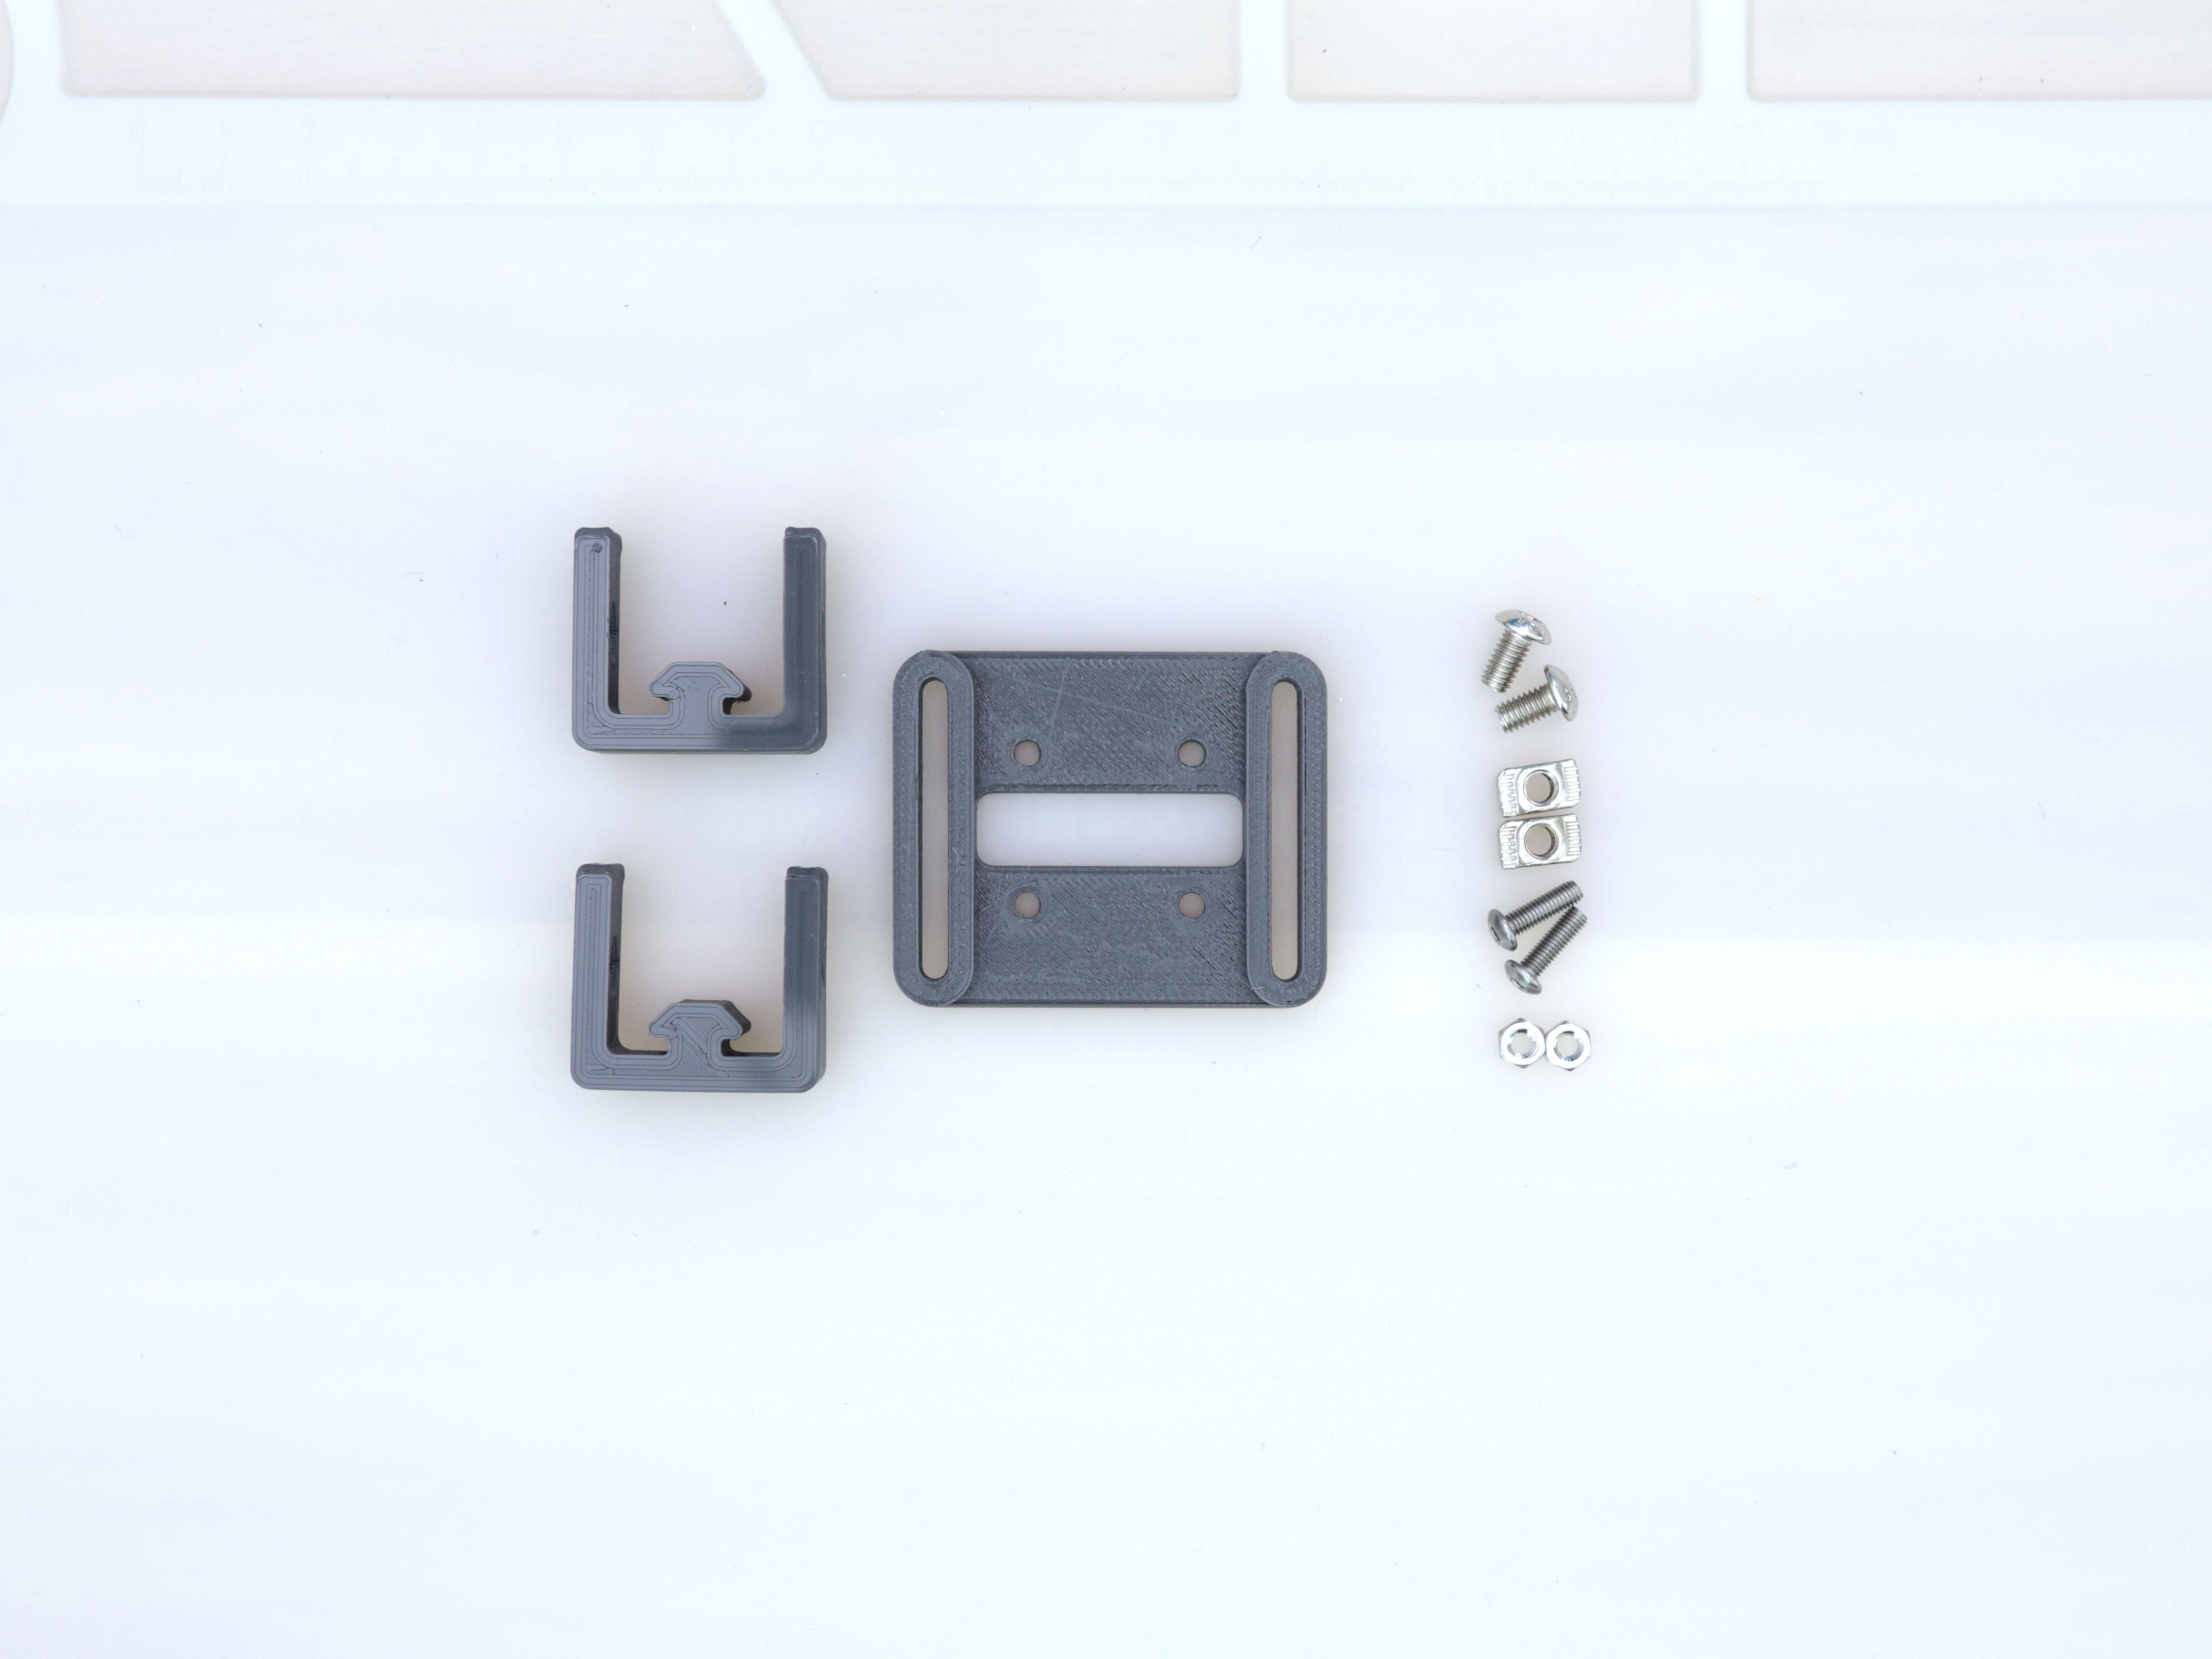 3d_printing_kick-parts.jpg